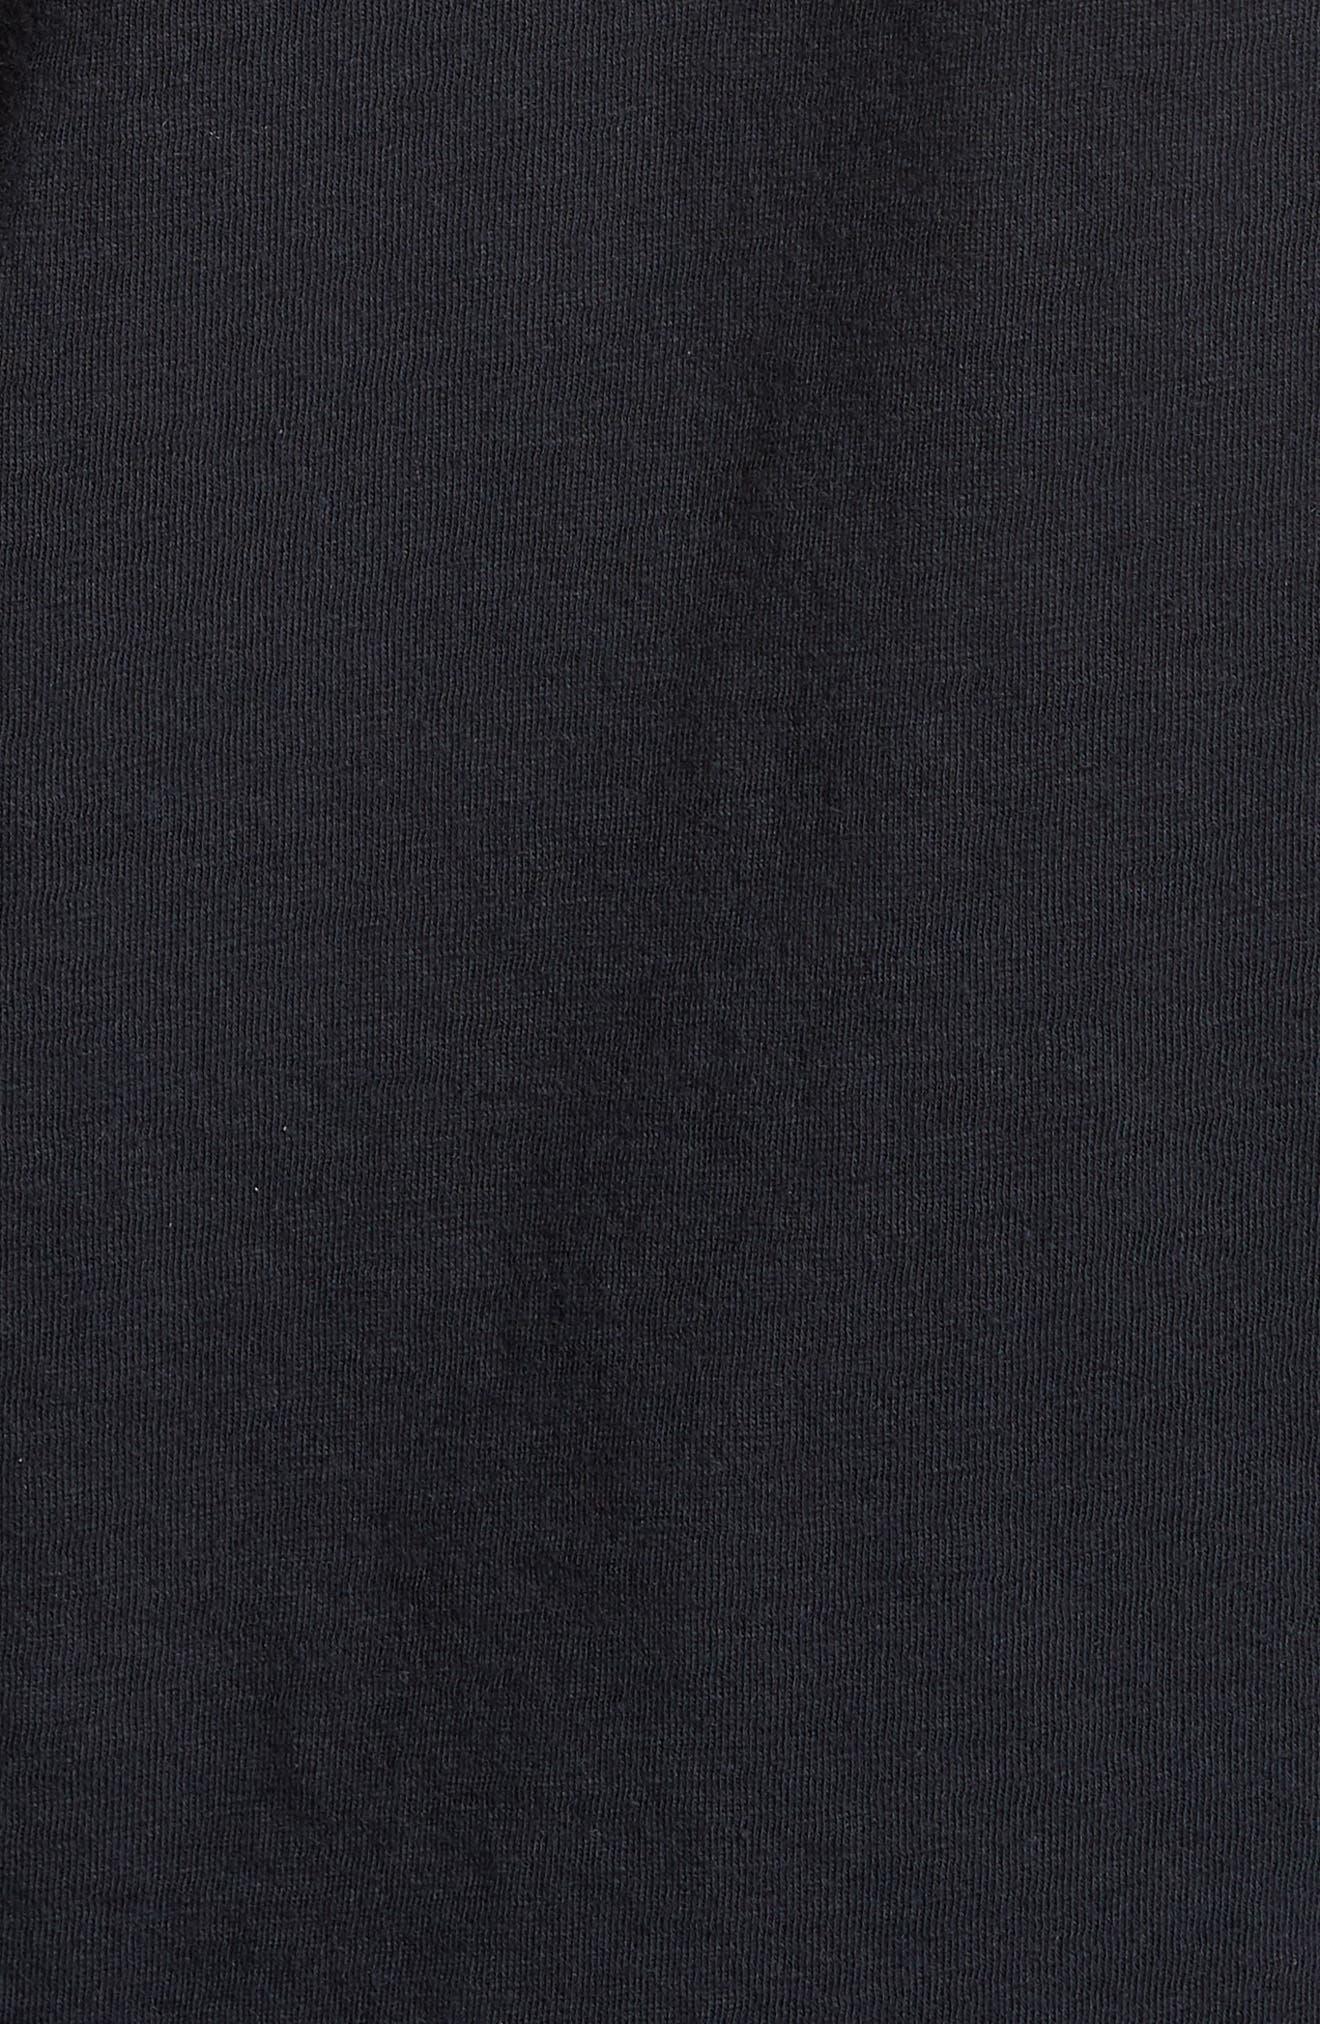 The Rolling Stones Trim Fit T-Shirt,                             Alternate thumbnail 5, color,                             Black Rolling Stones